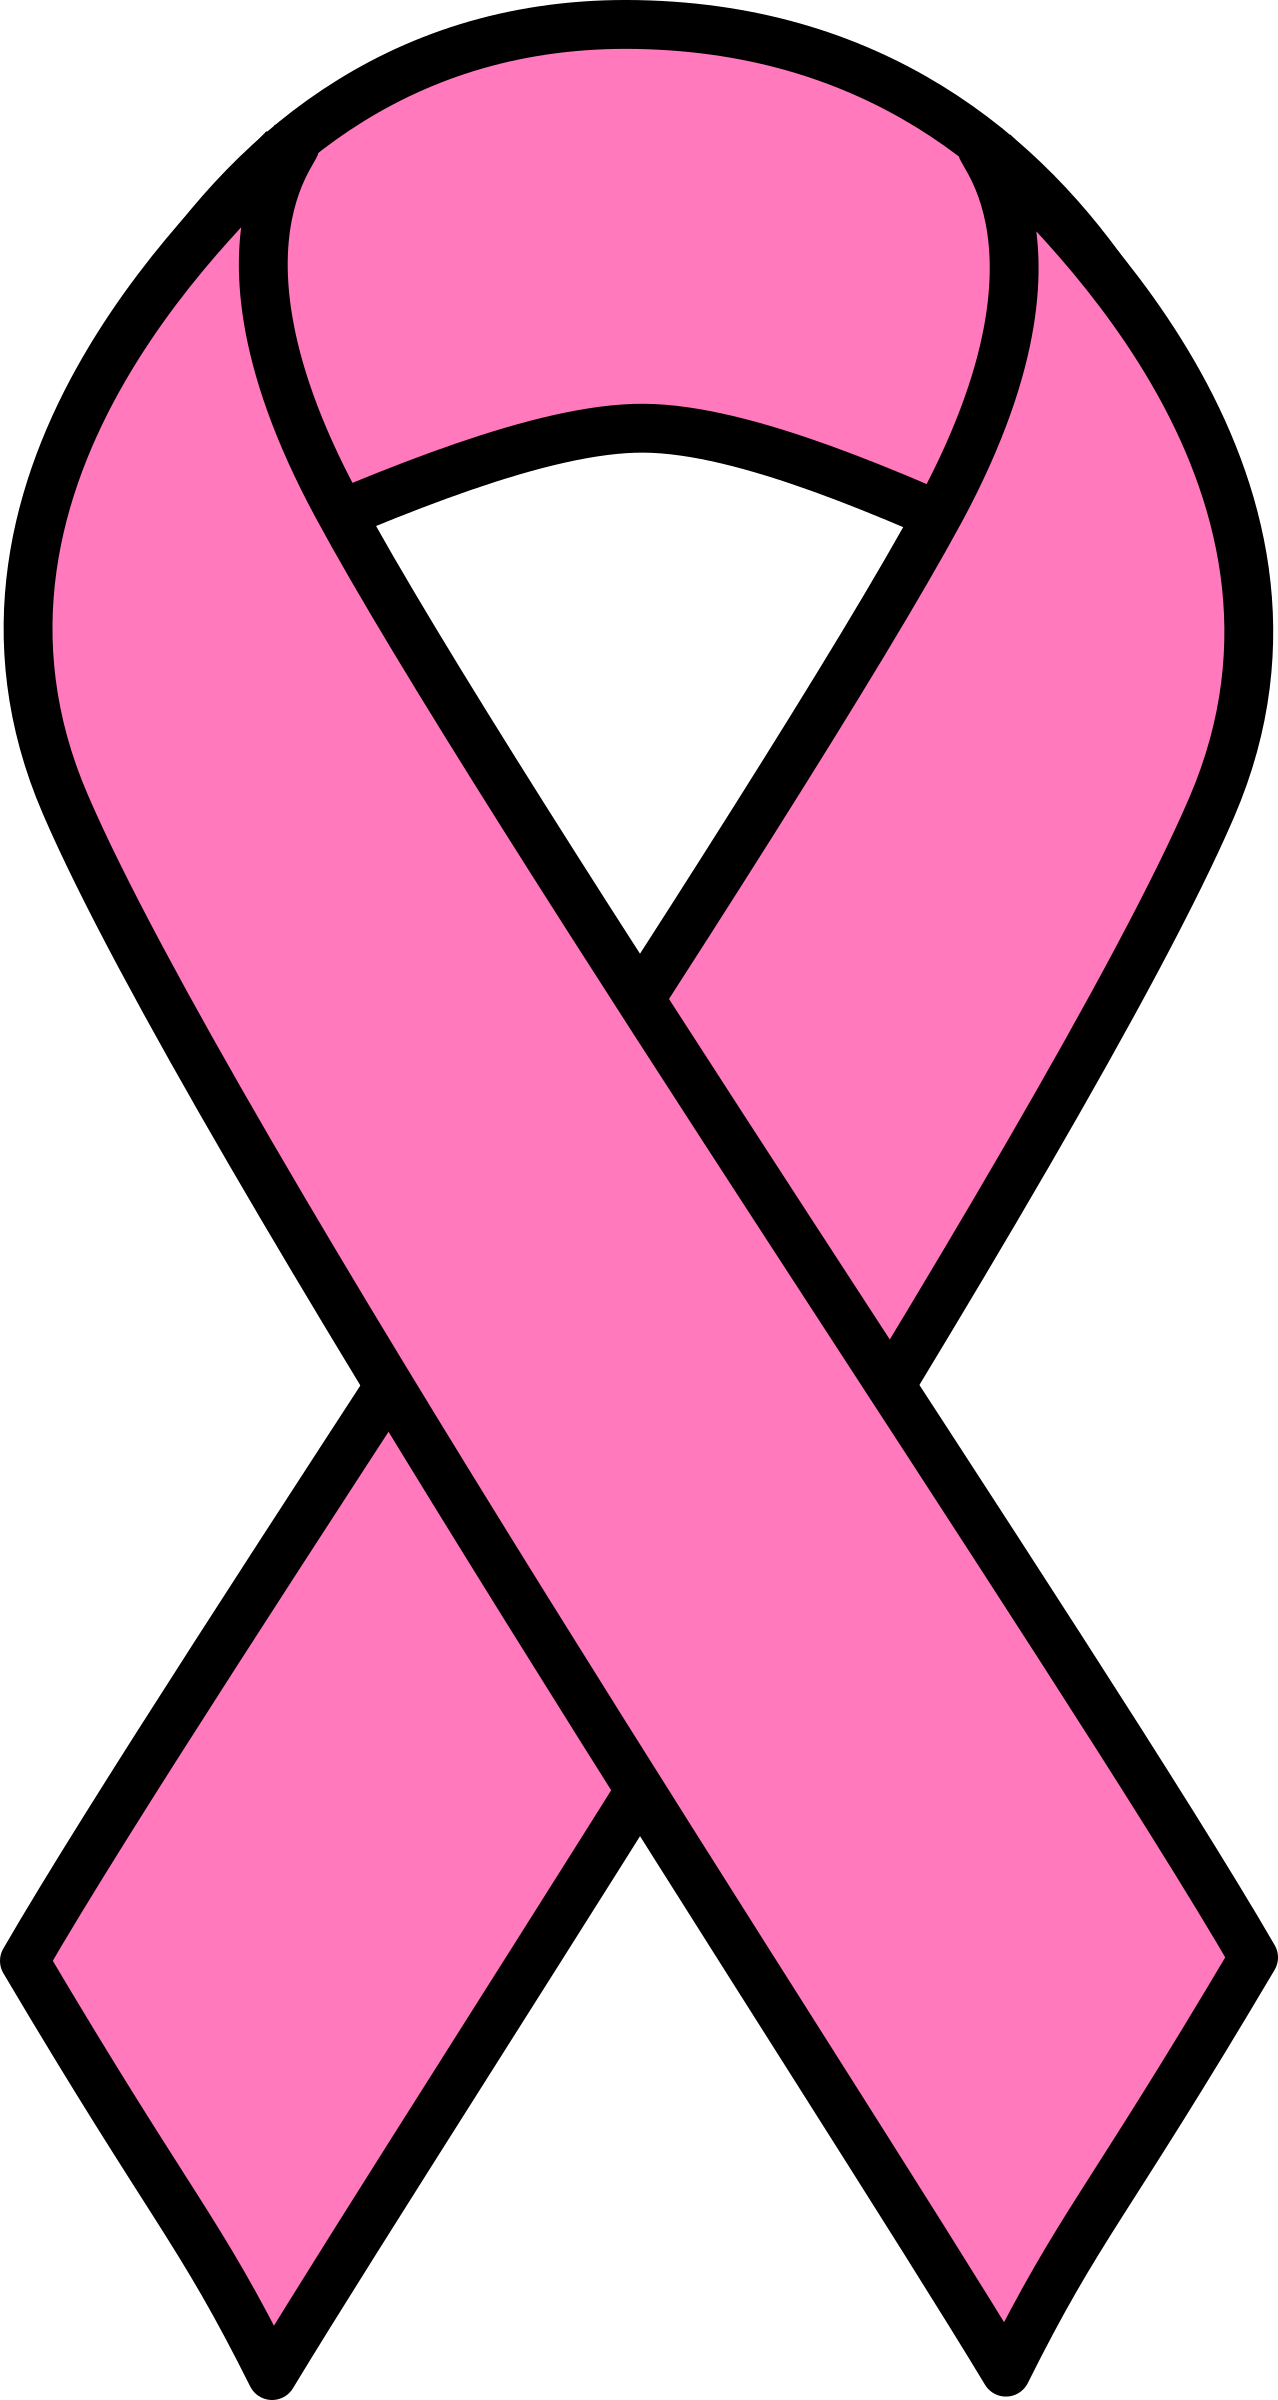 Cancer awareness ribbon clip art clip art freeuse Breast cancer awareness ribbon clip art 3 - Clipartix clip art freeuse